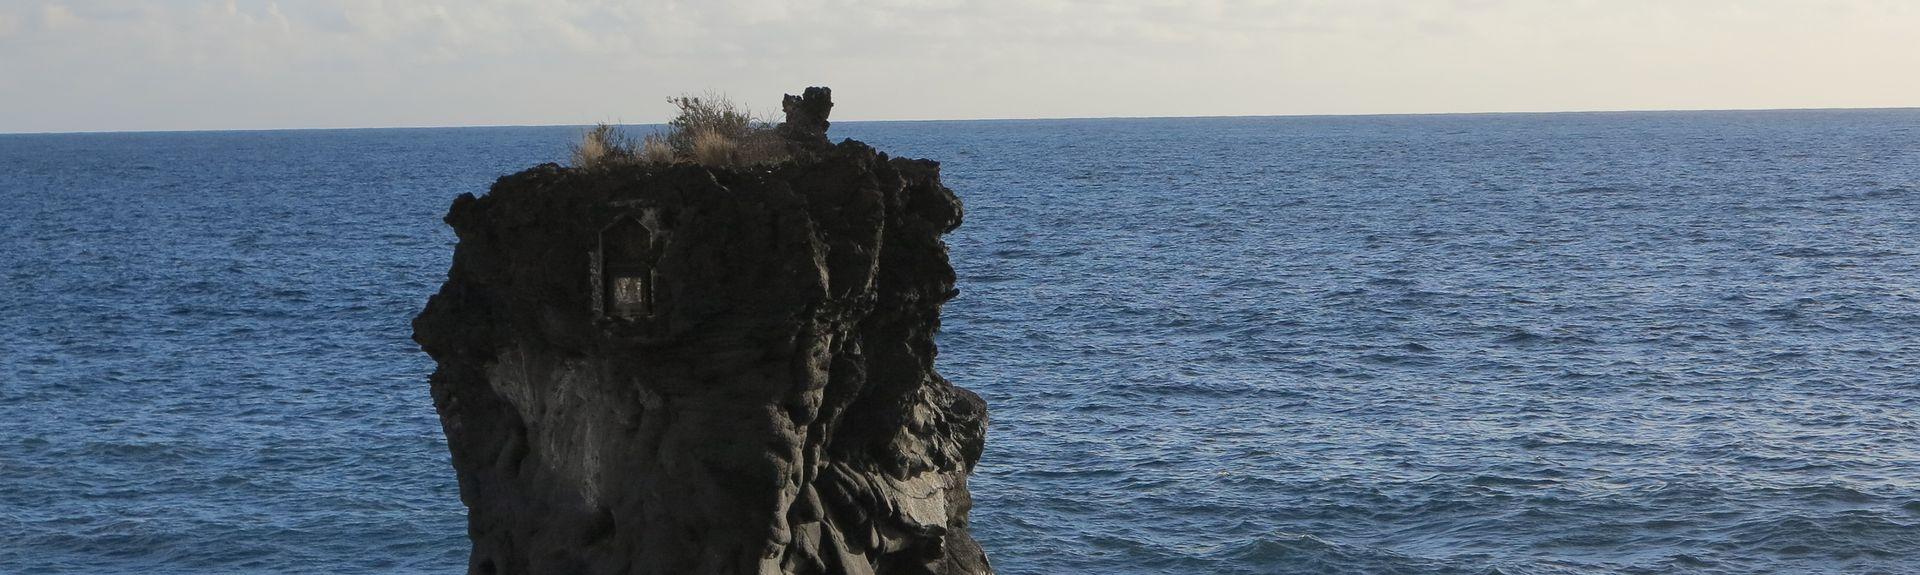 Puerto, Santa Cruz de Tenerife, Spain